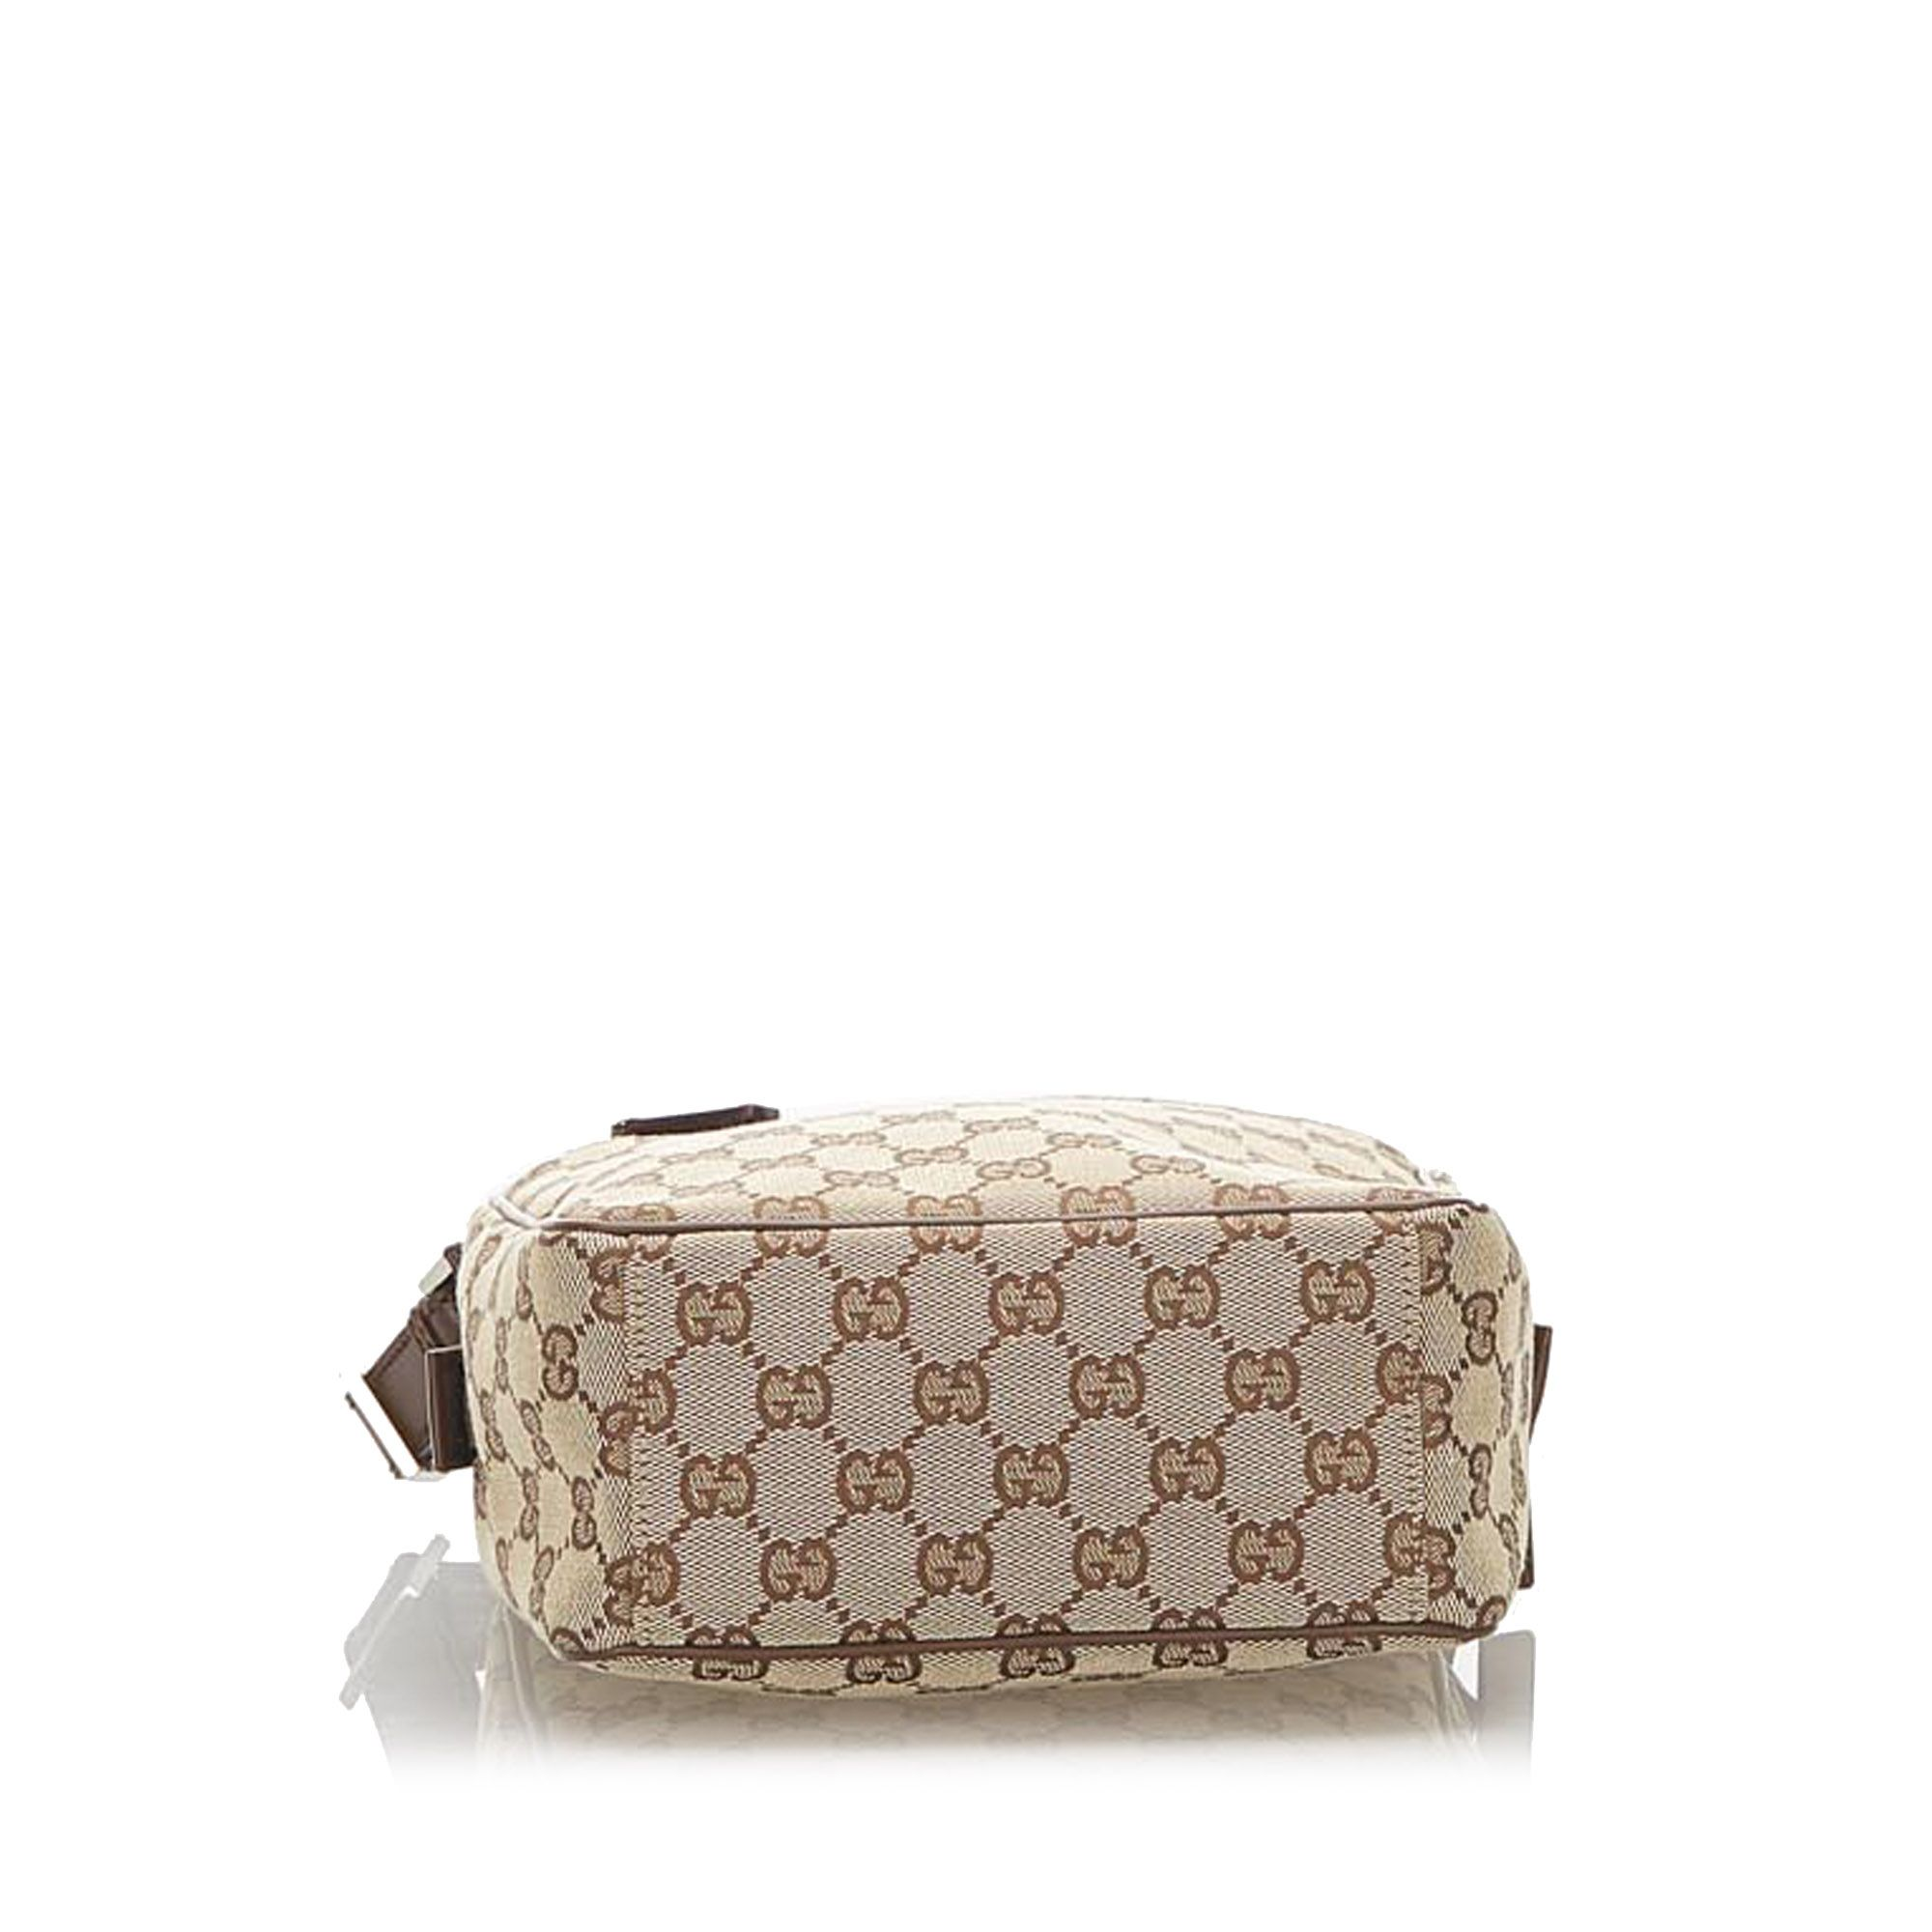 Vintage Gucci GG Canvas Crossbody Bag Brown